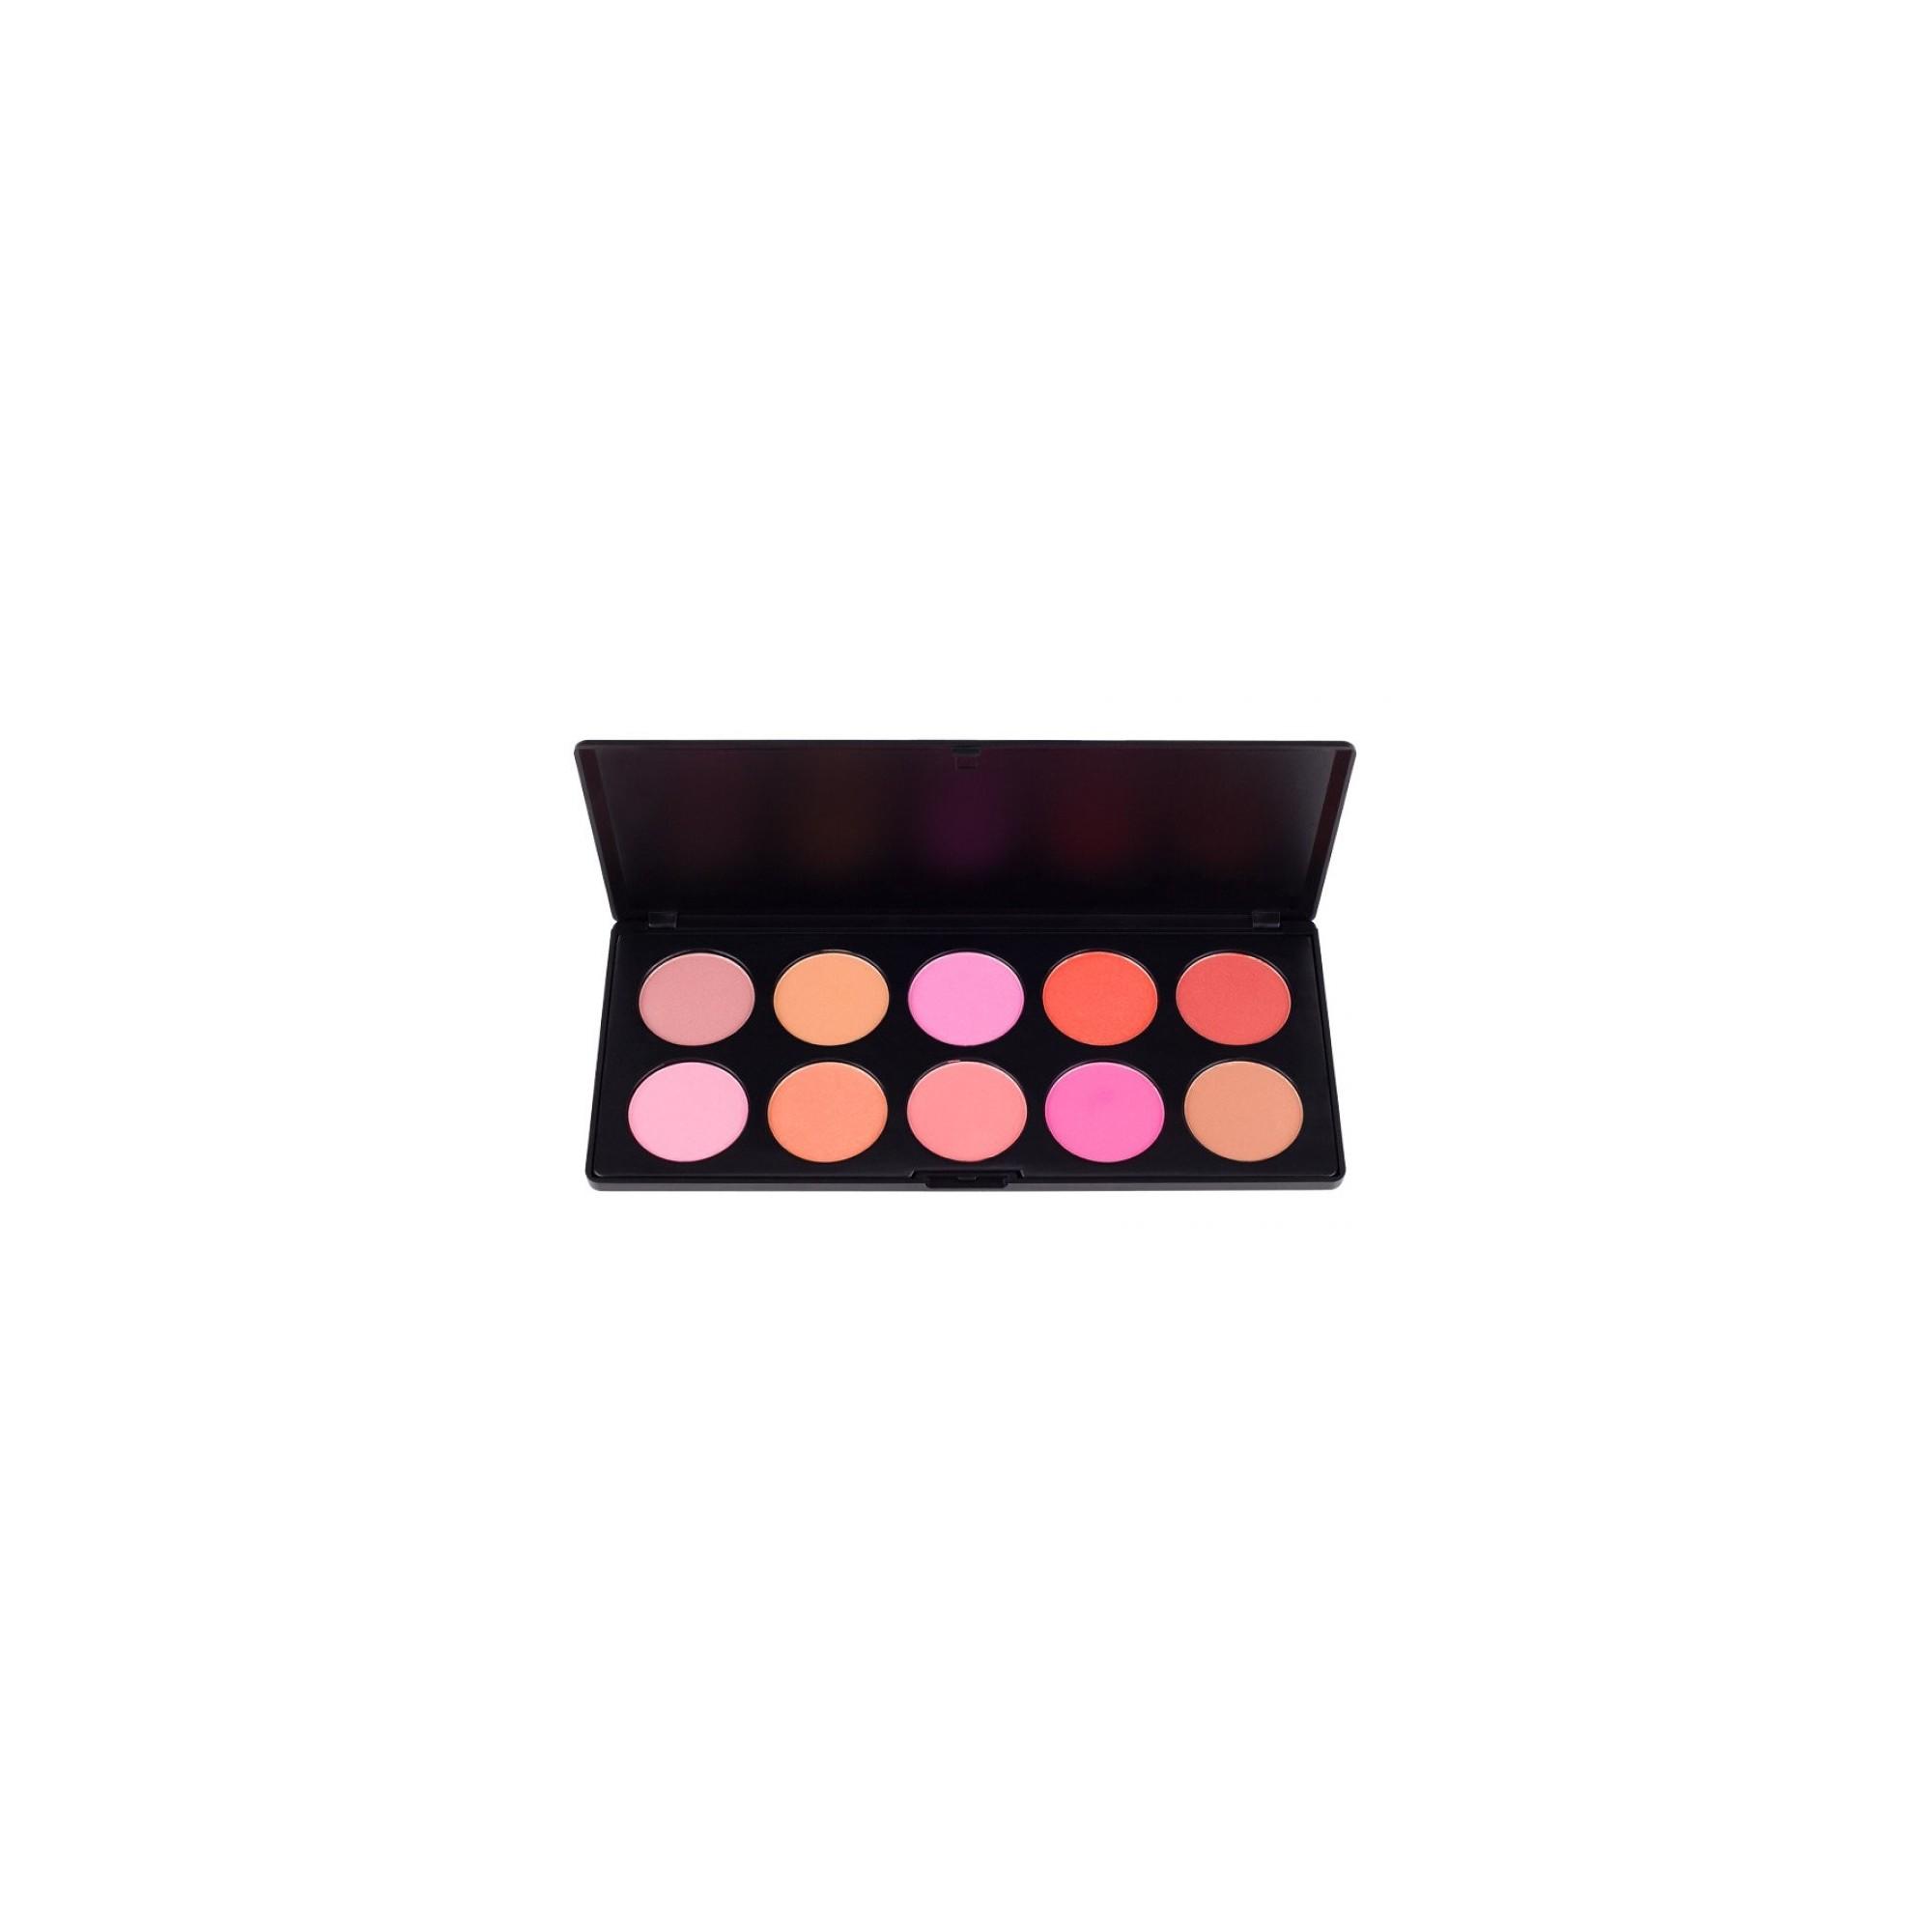 Costal Scents 10 Blush Palette